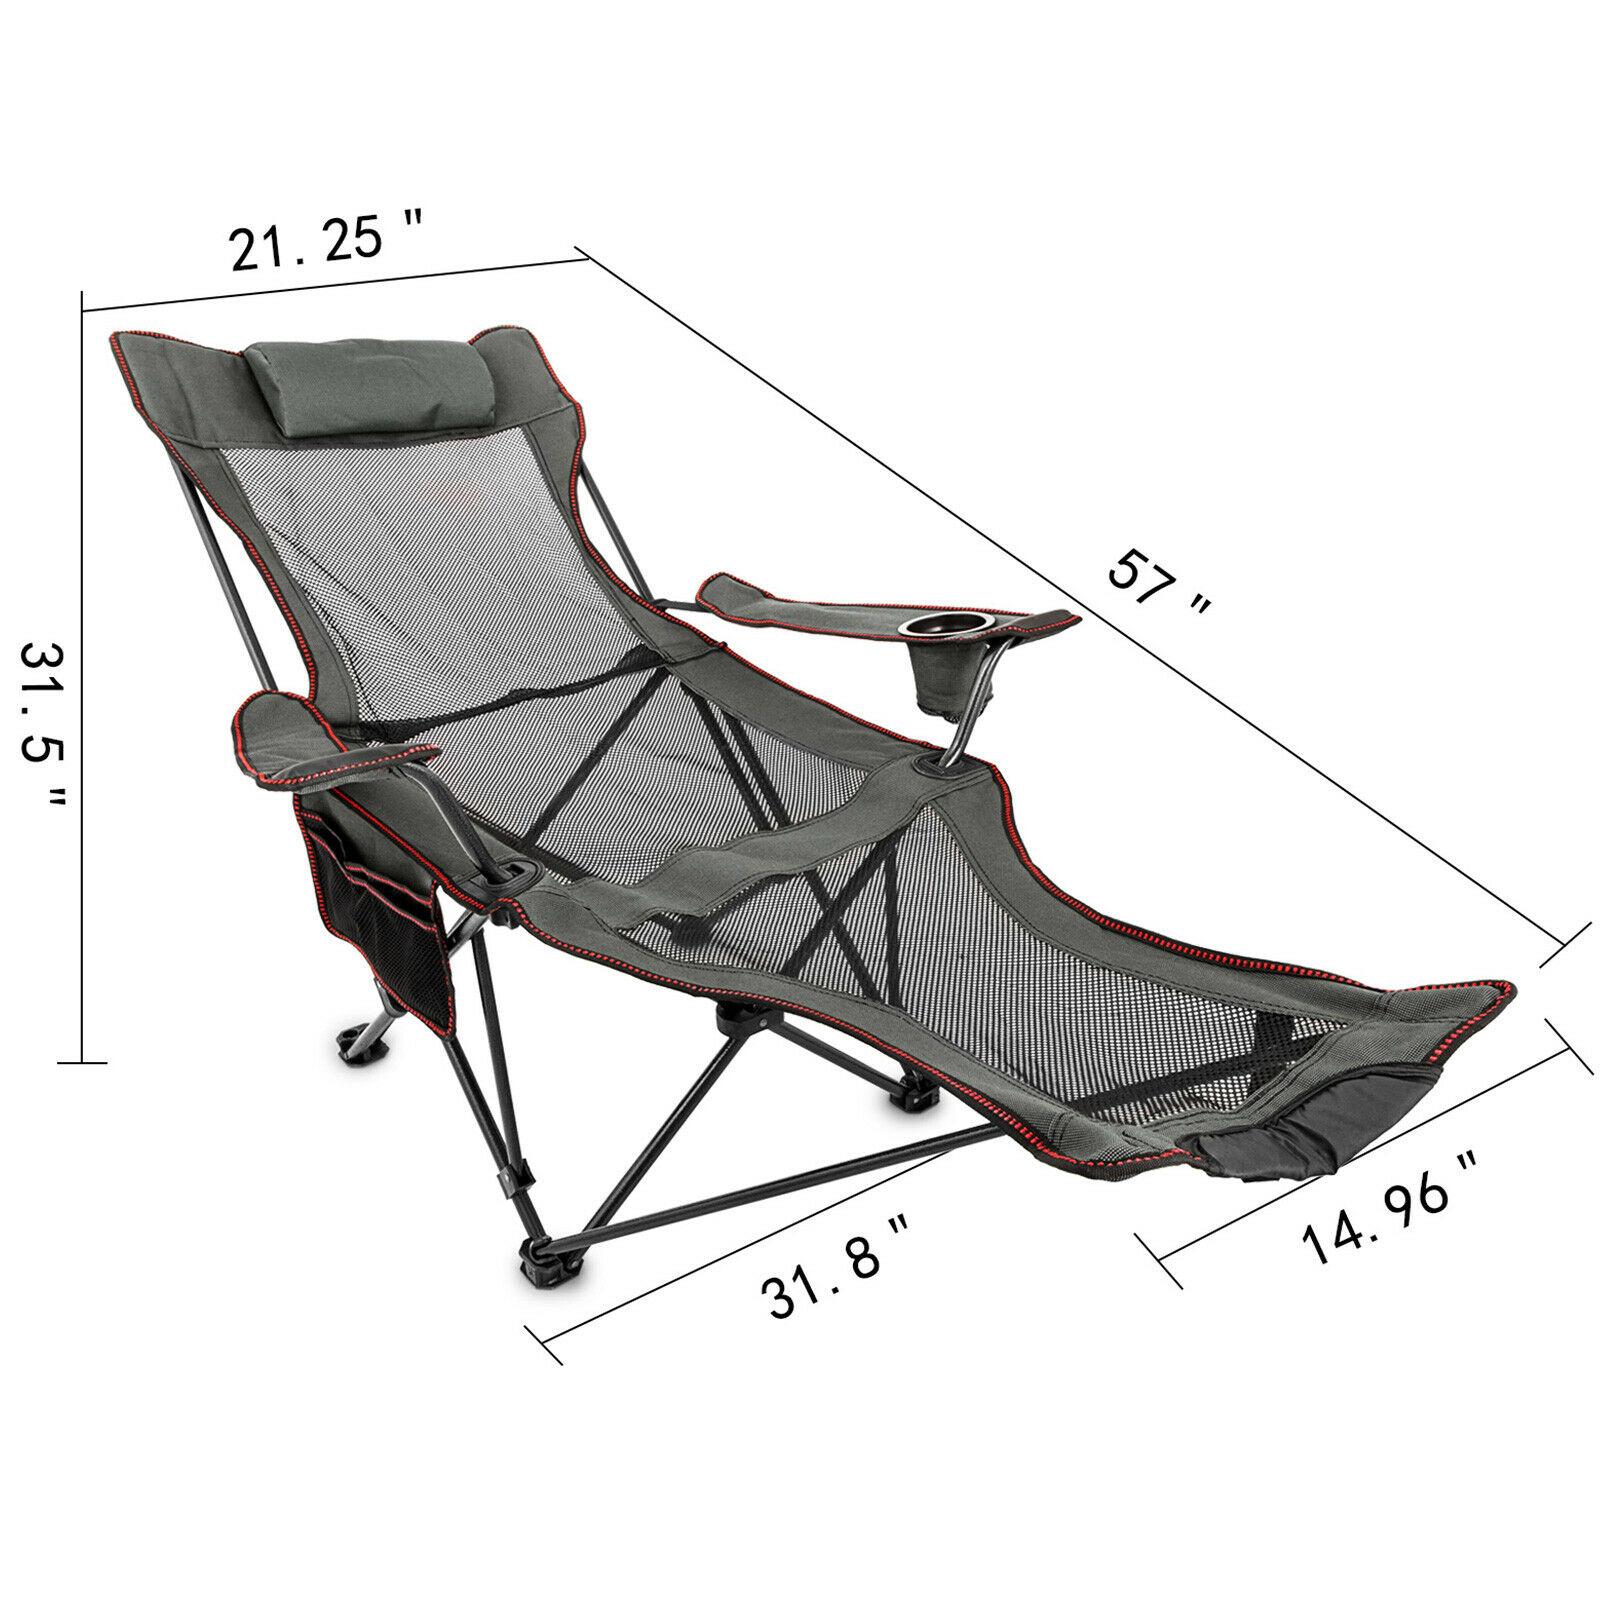 MuddyHunting Reclining Folding Camp Chair 5